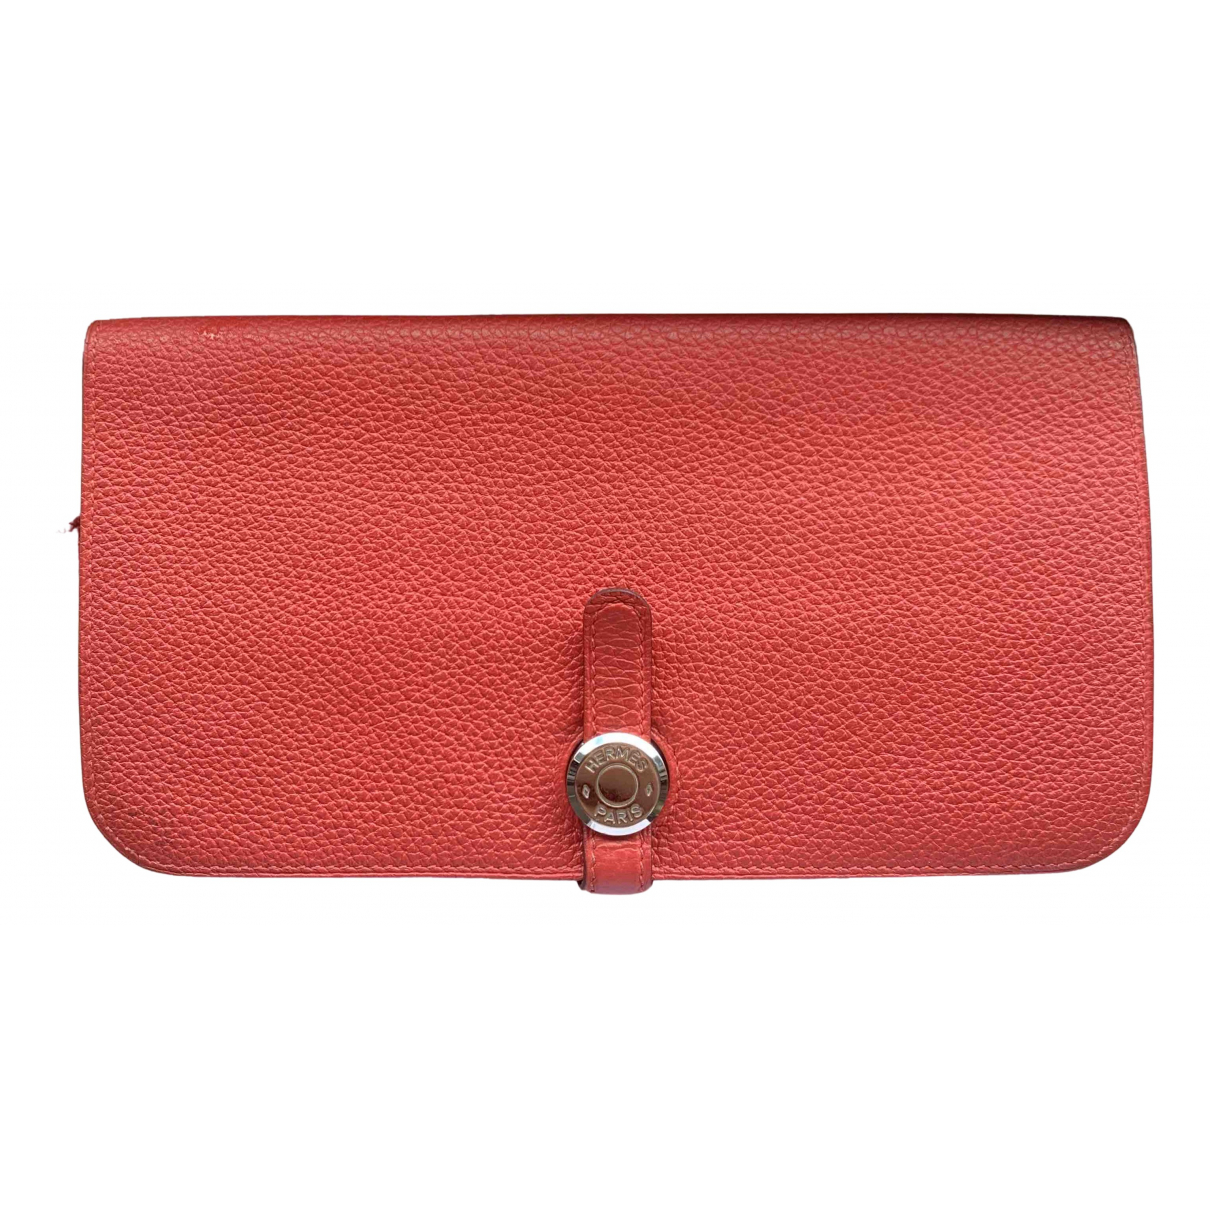 Hermes - Portefeuille Dogon pour femme en cuir - rose